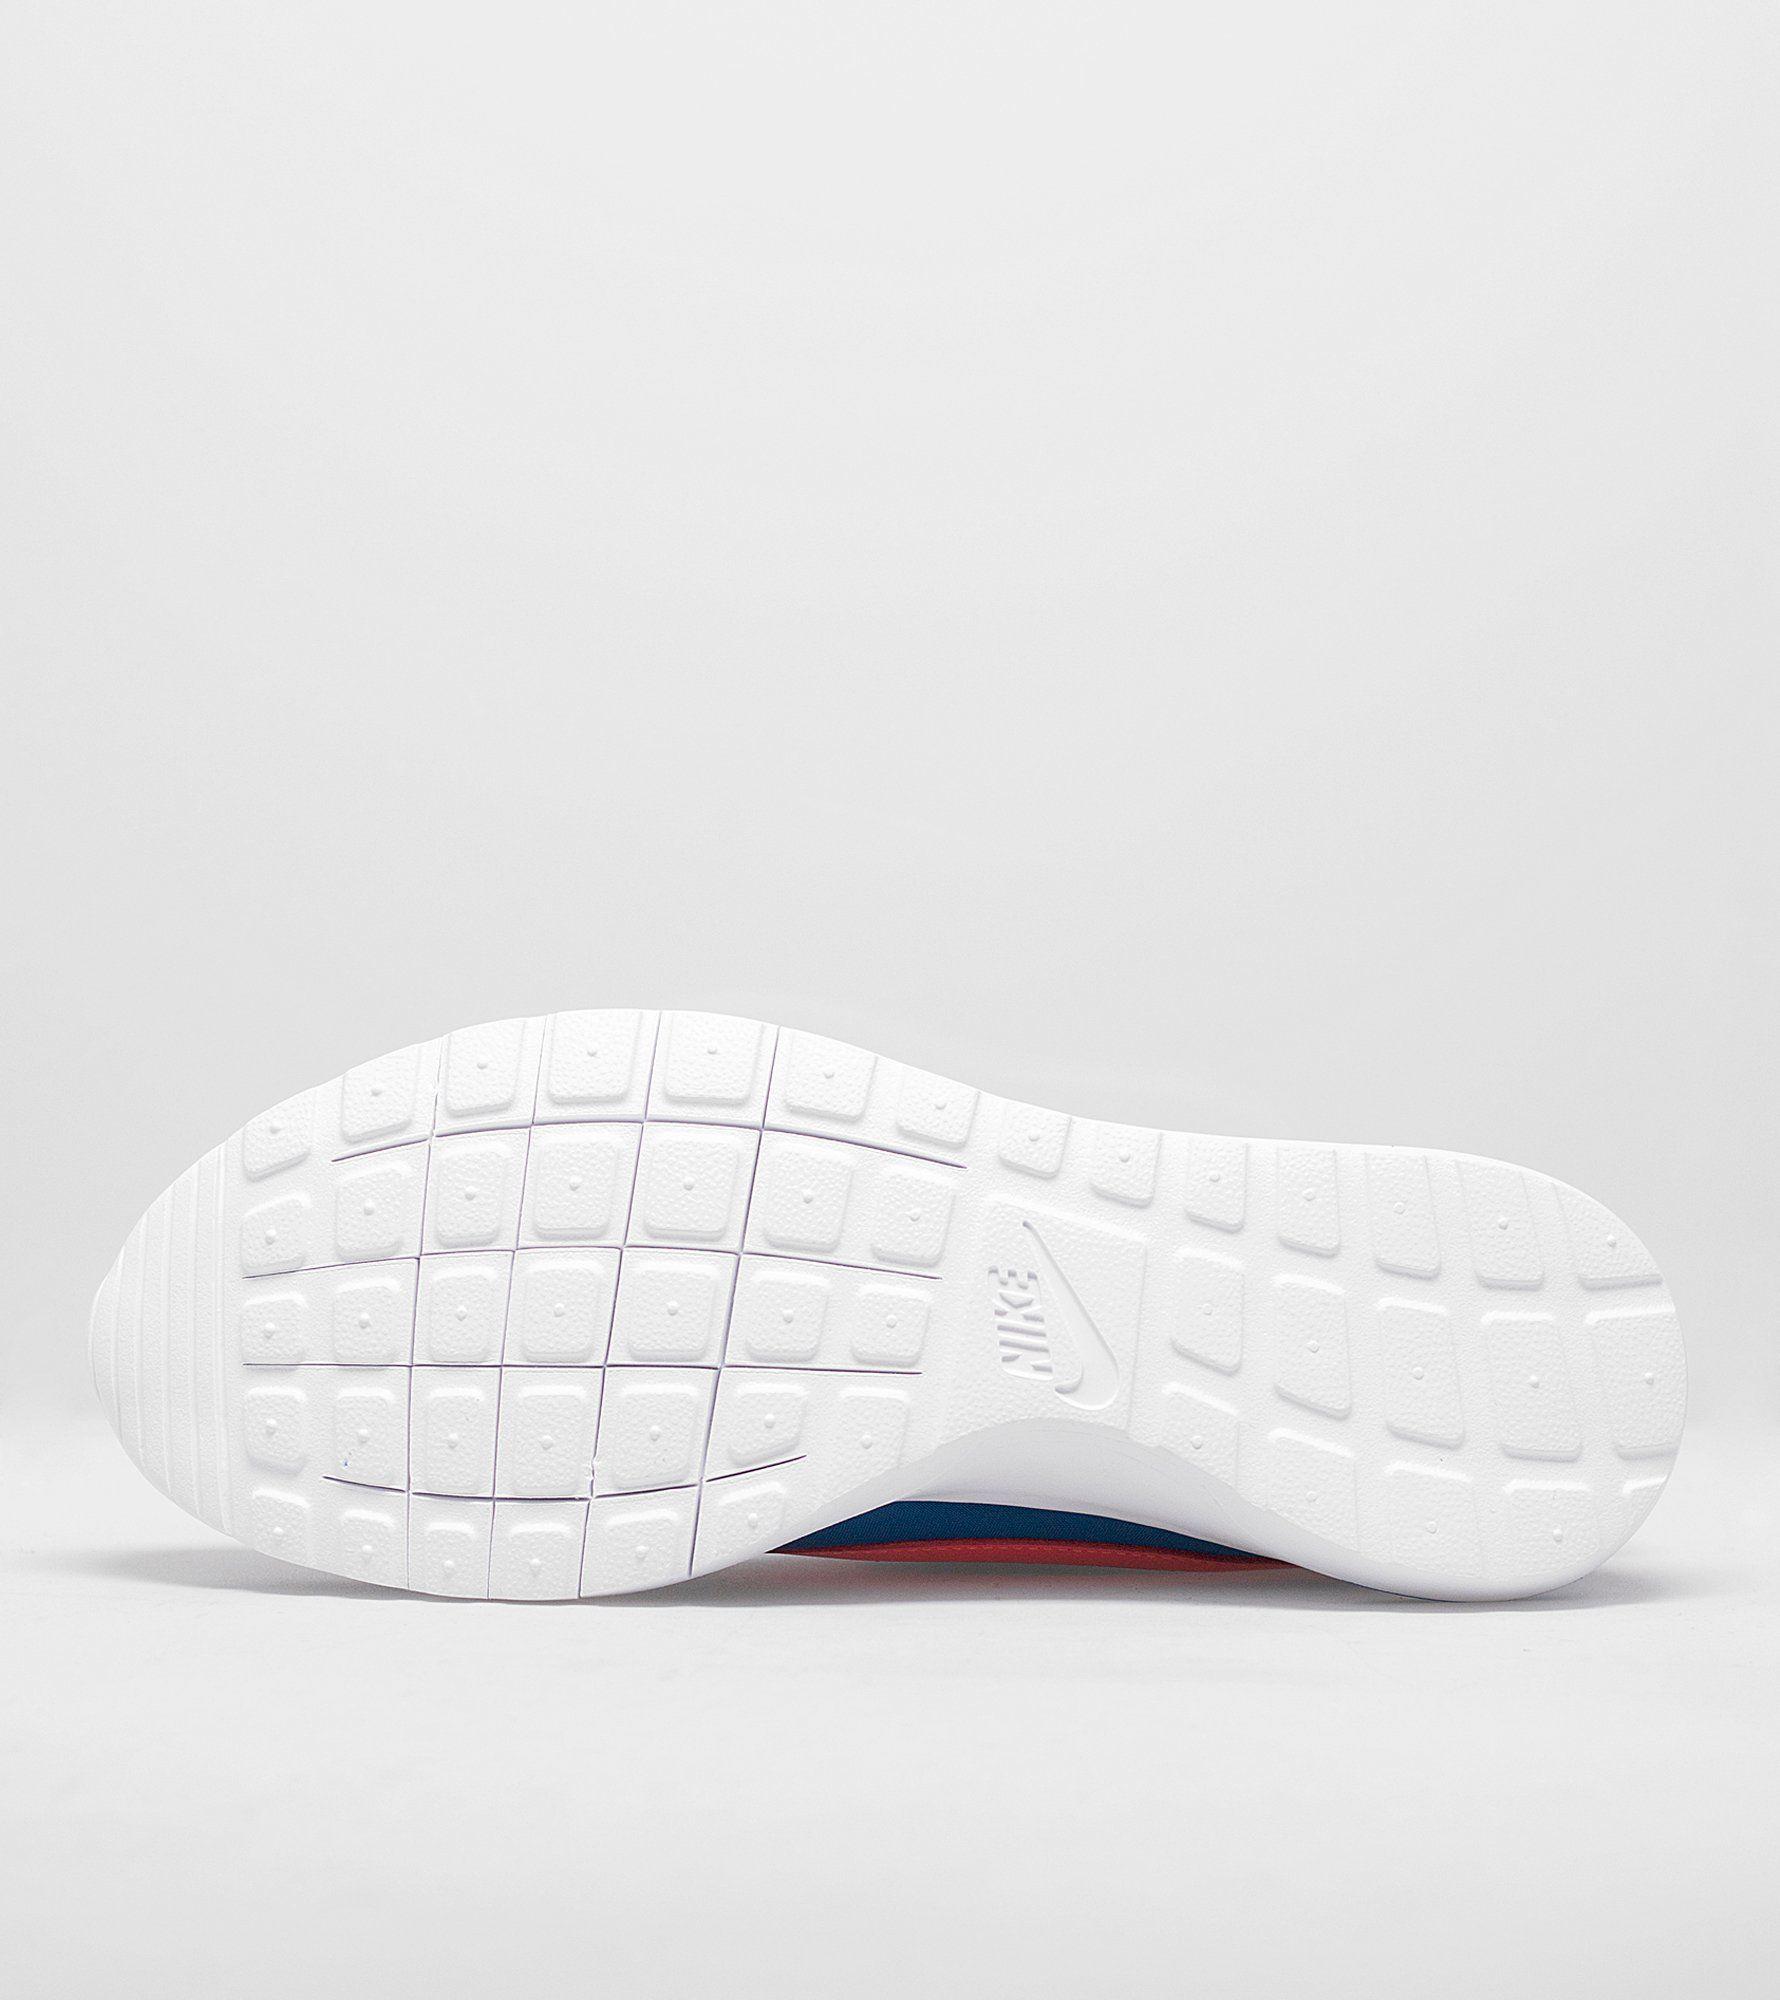 Nike Roshe Cortez New Motion